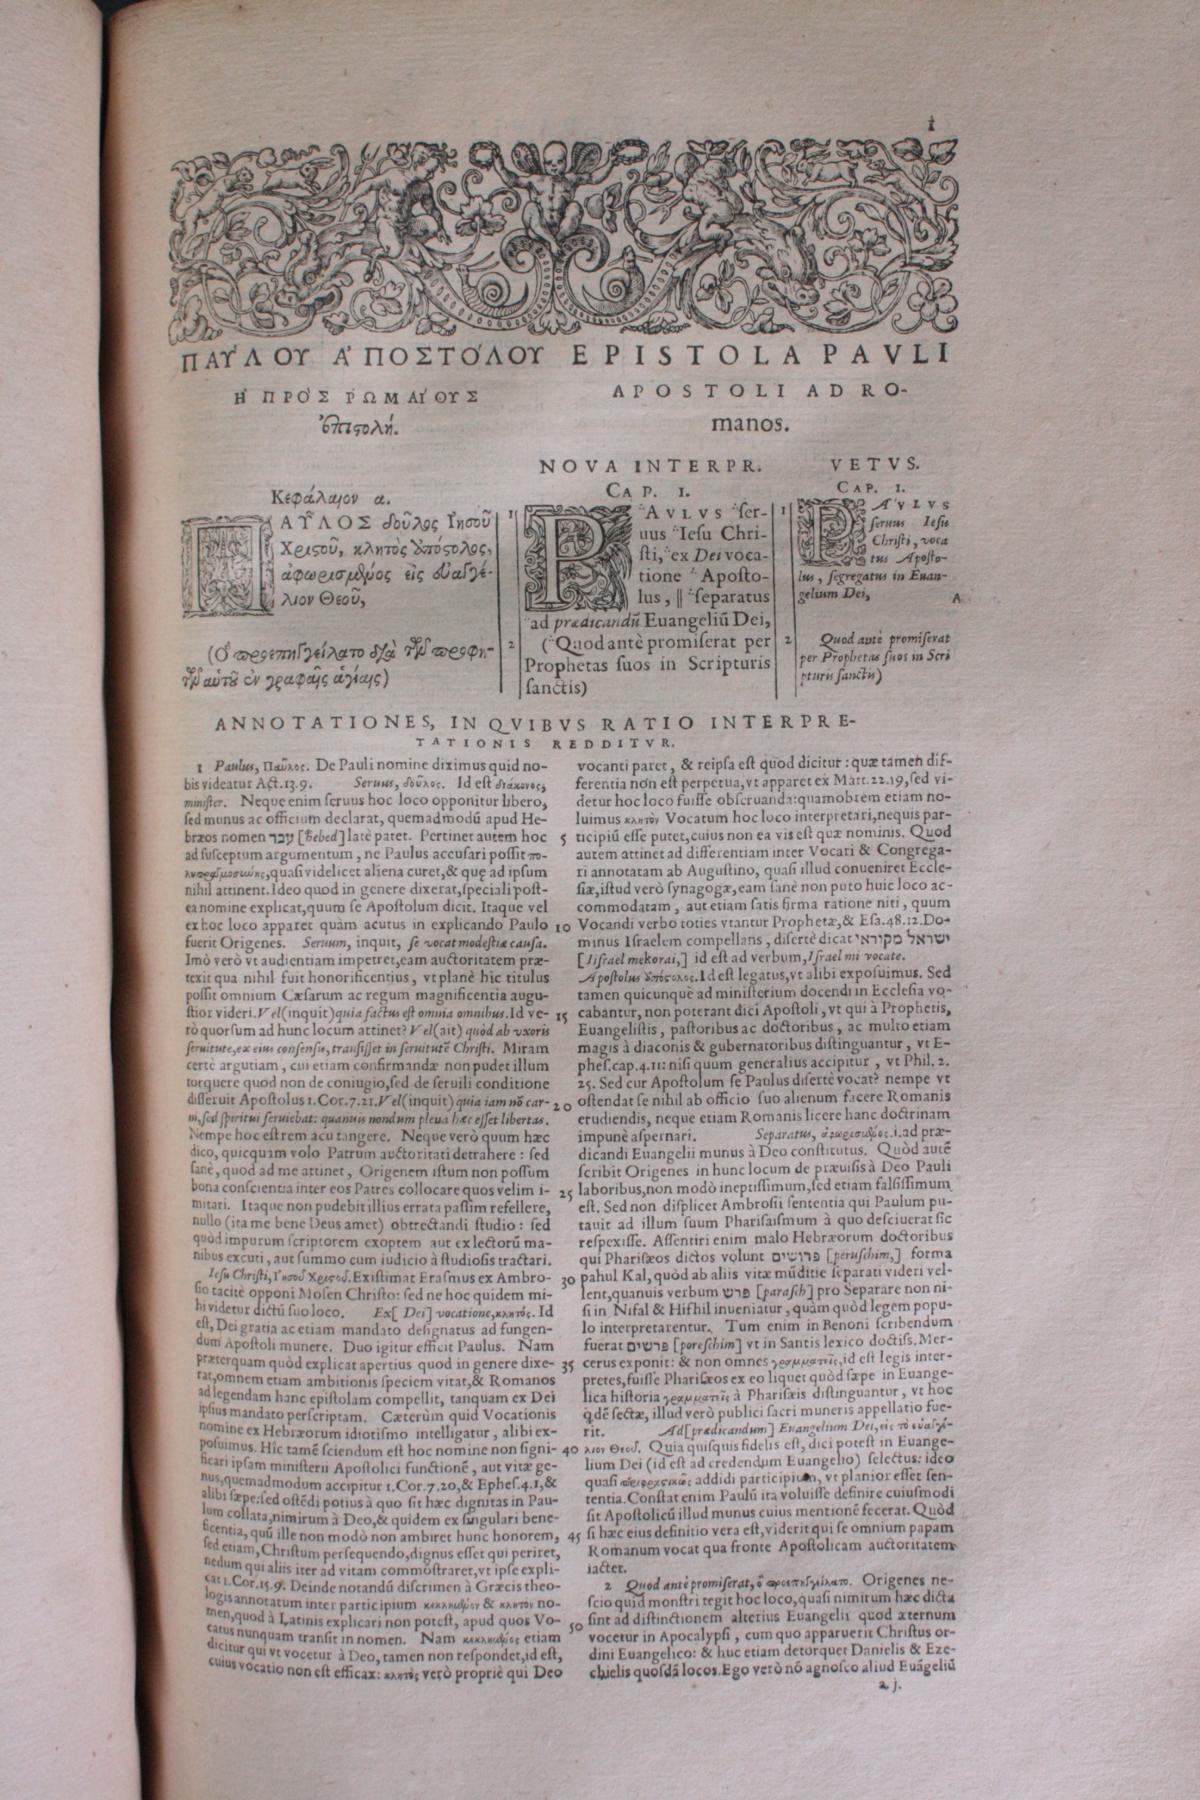 Griechische-Lateinische Bibel, Novum Testamentum 1582-12